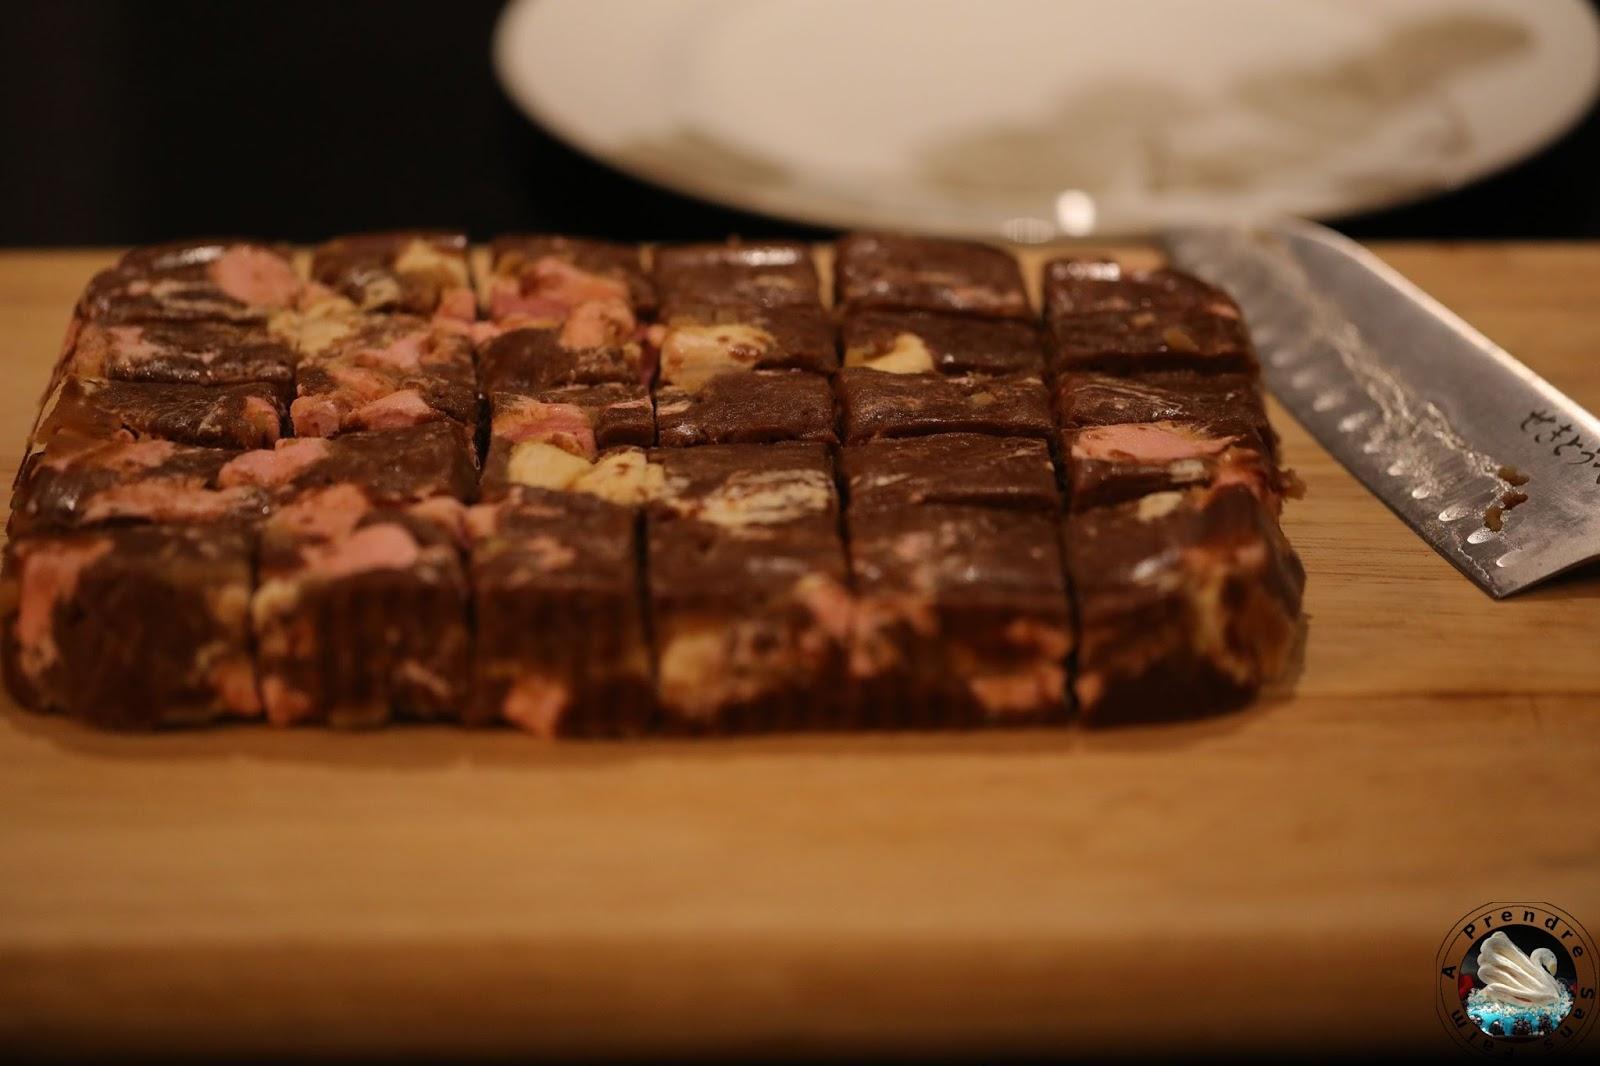 Barres au chocolat et biscuits